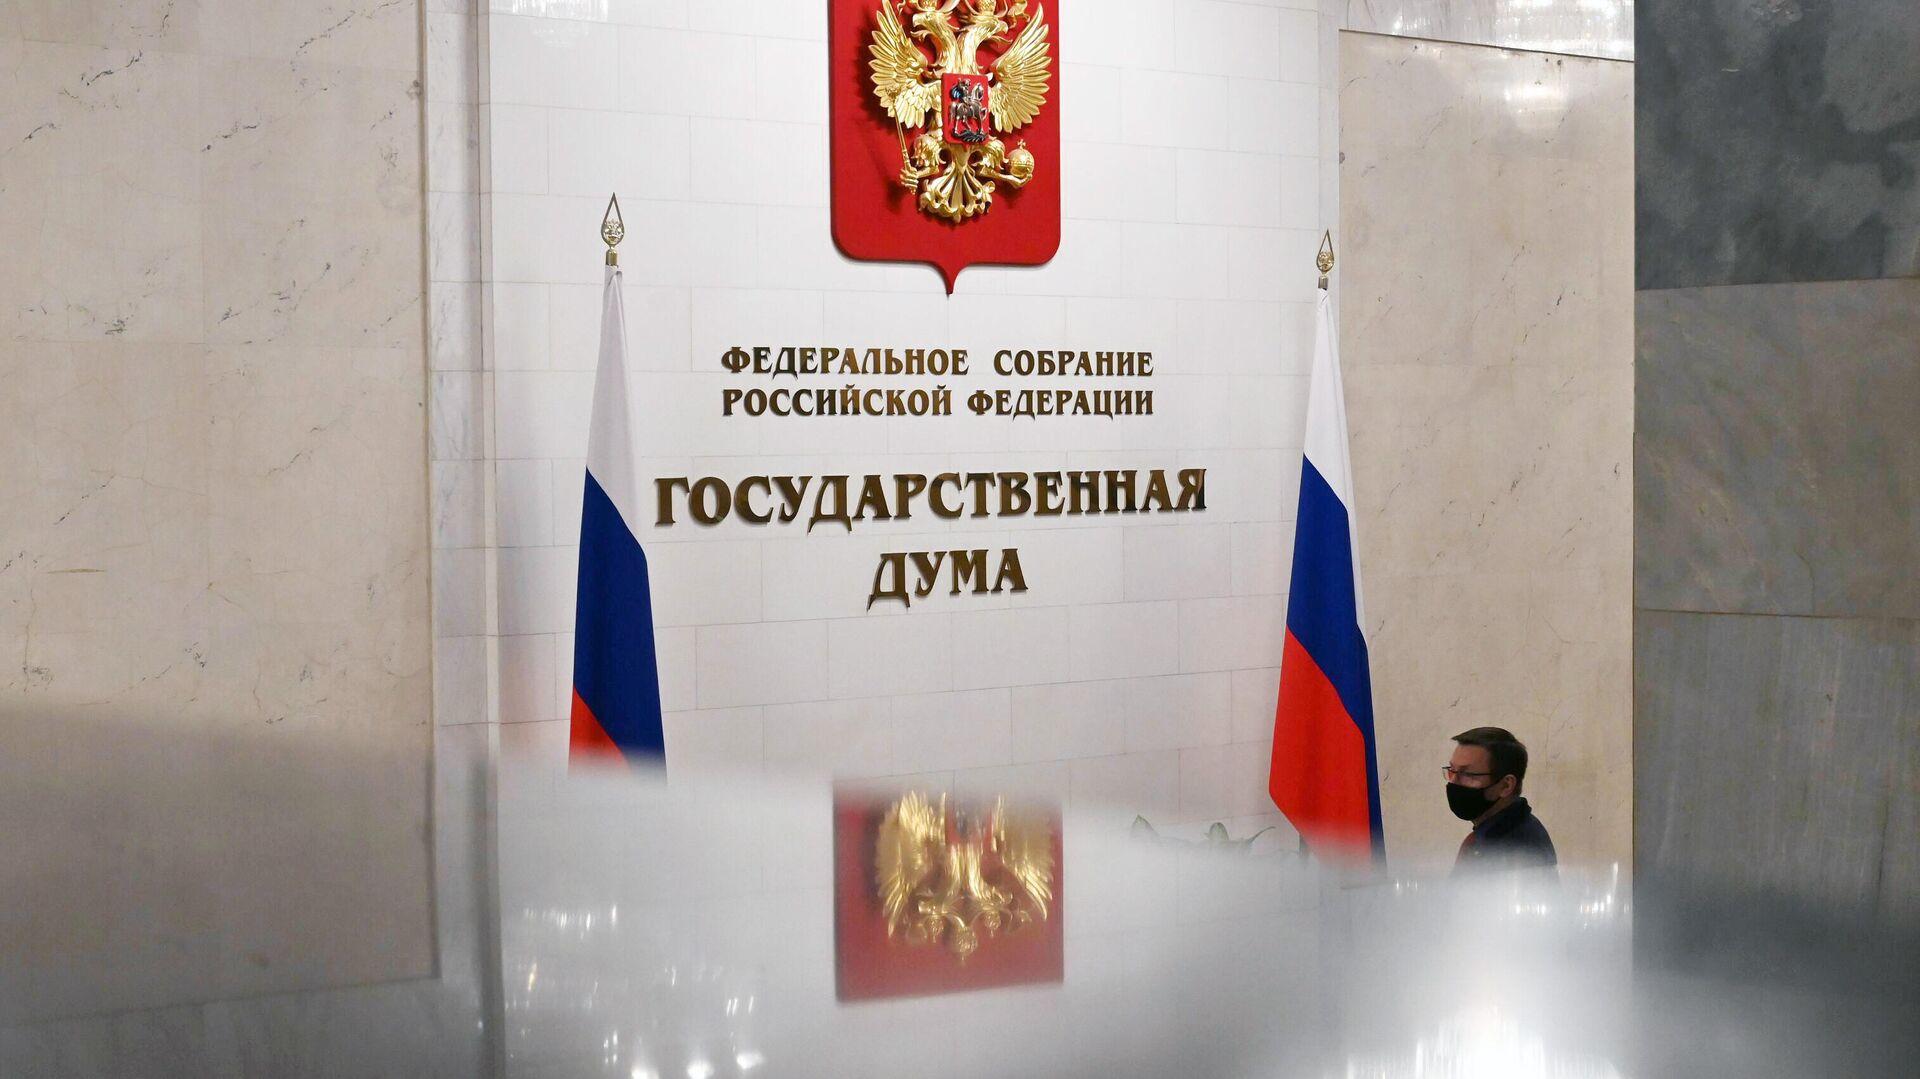 В Госдуме предложили увеличить число комитетов